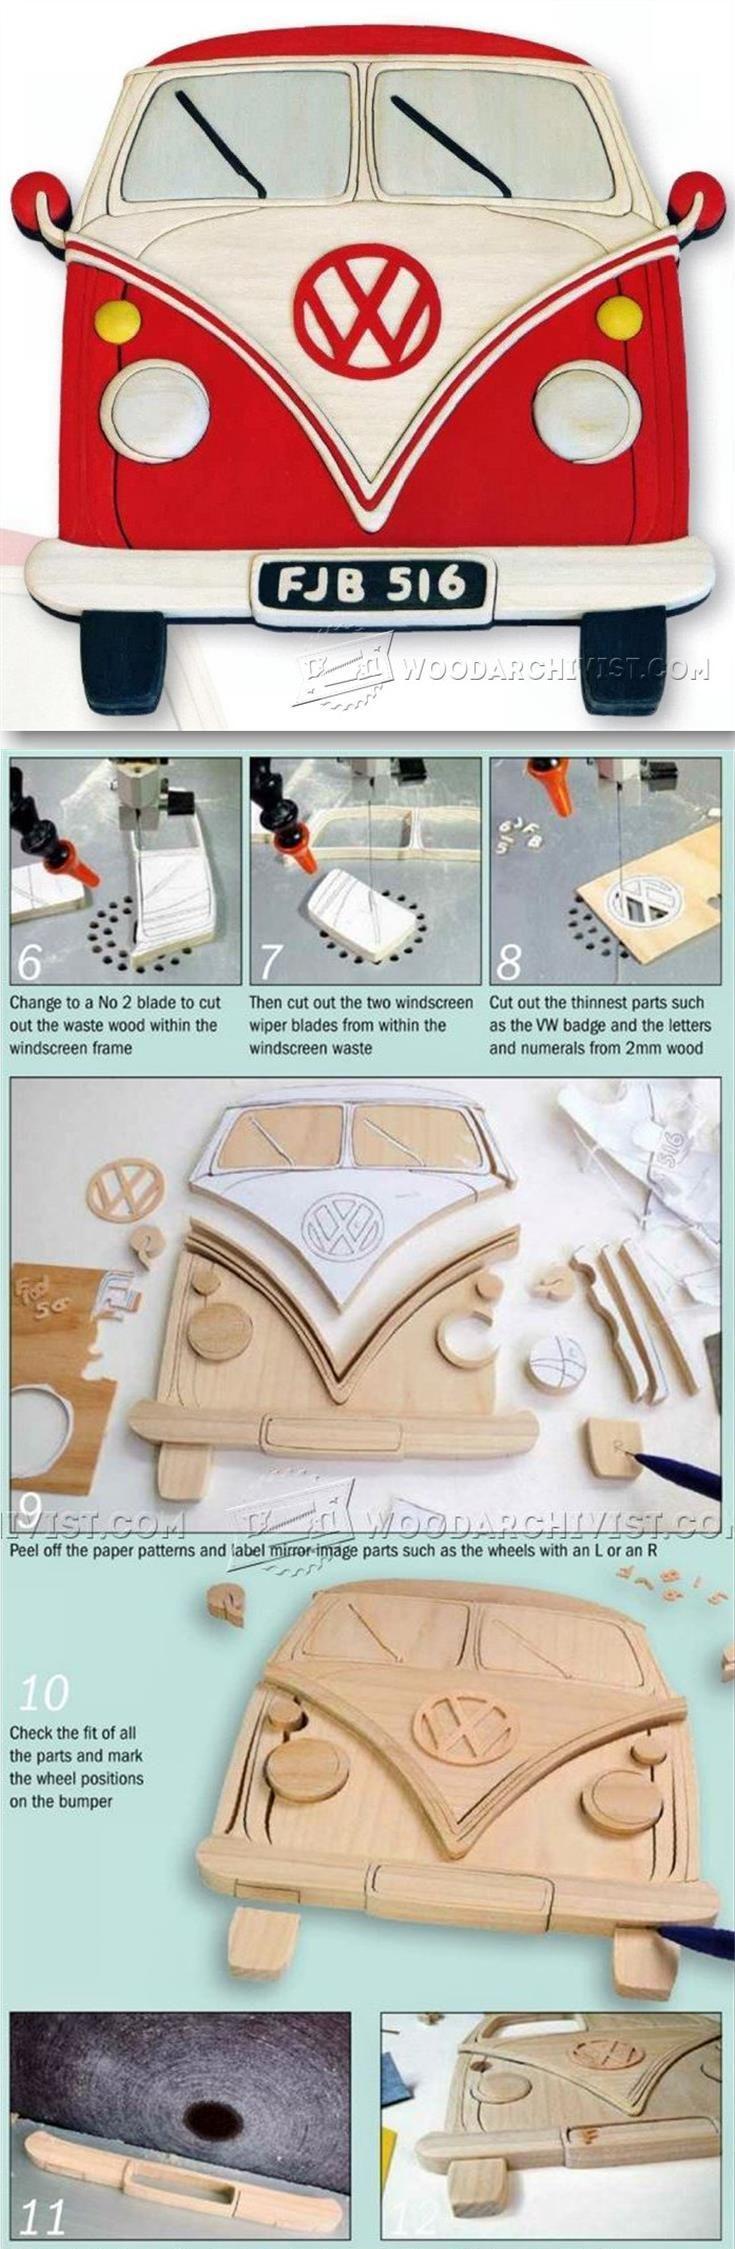 VW Camper - Intarsia Projects, Tips and Techniques | WoodArchivist.com